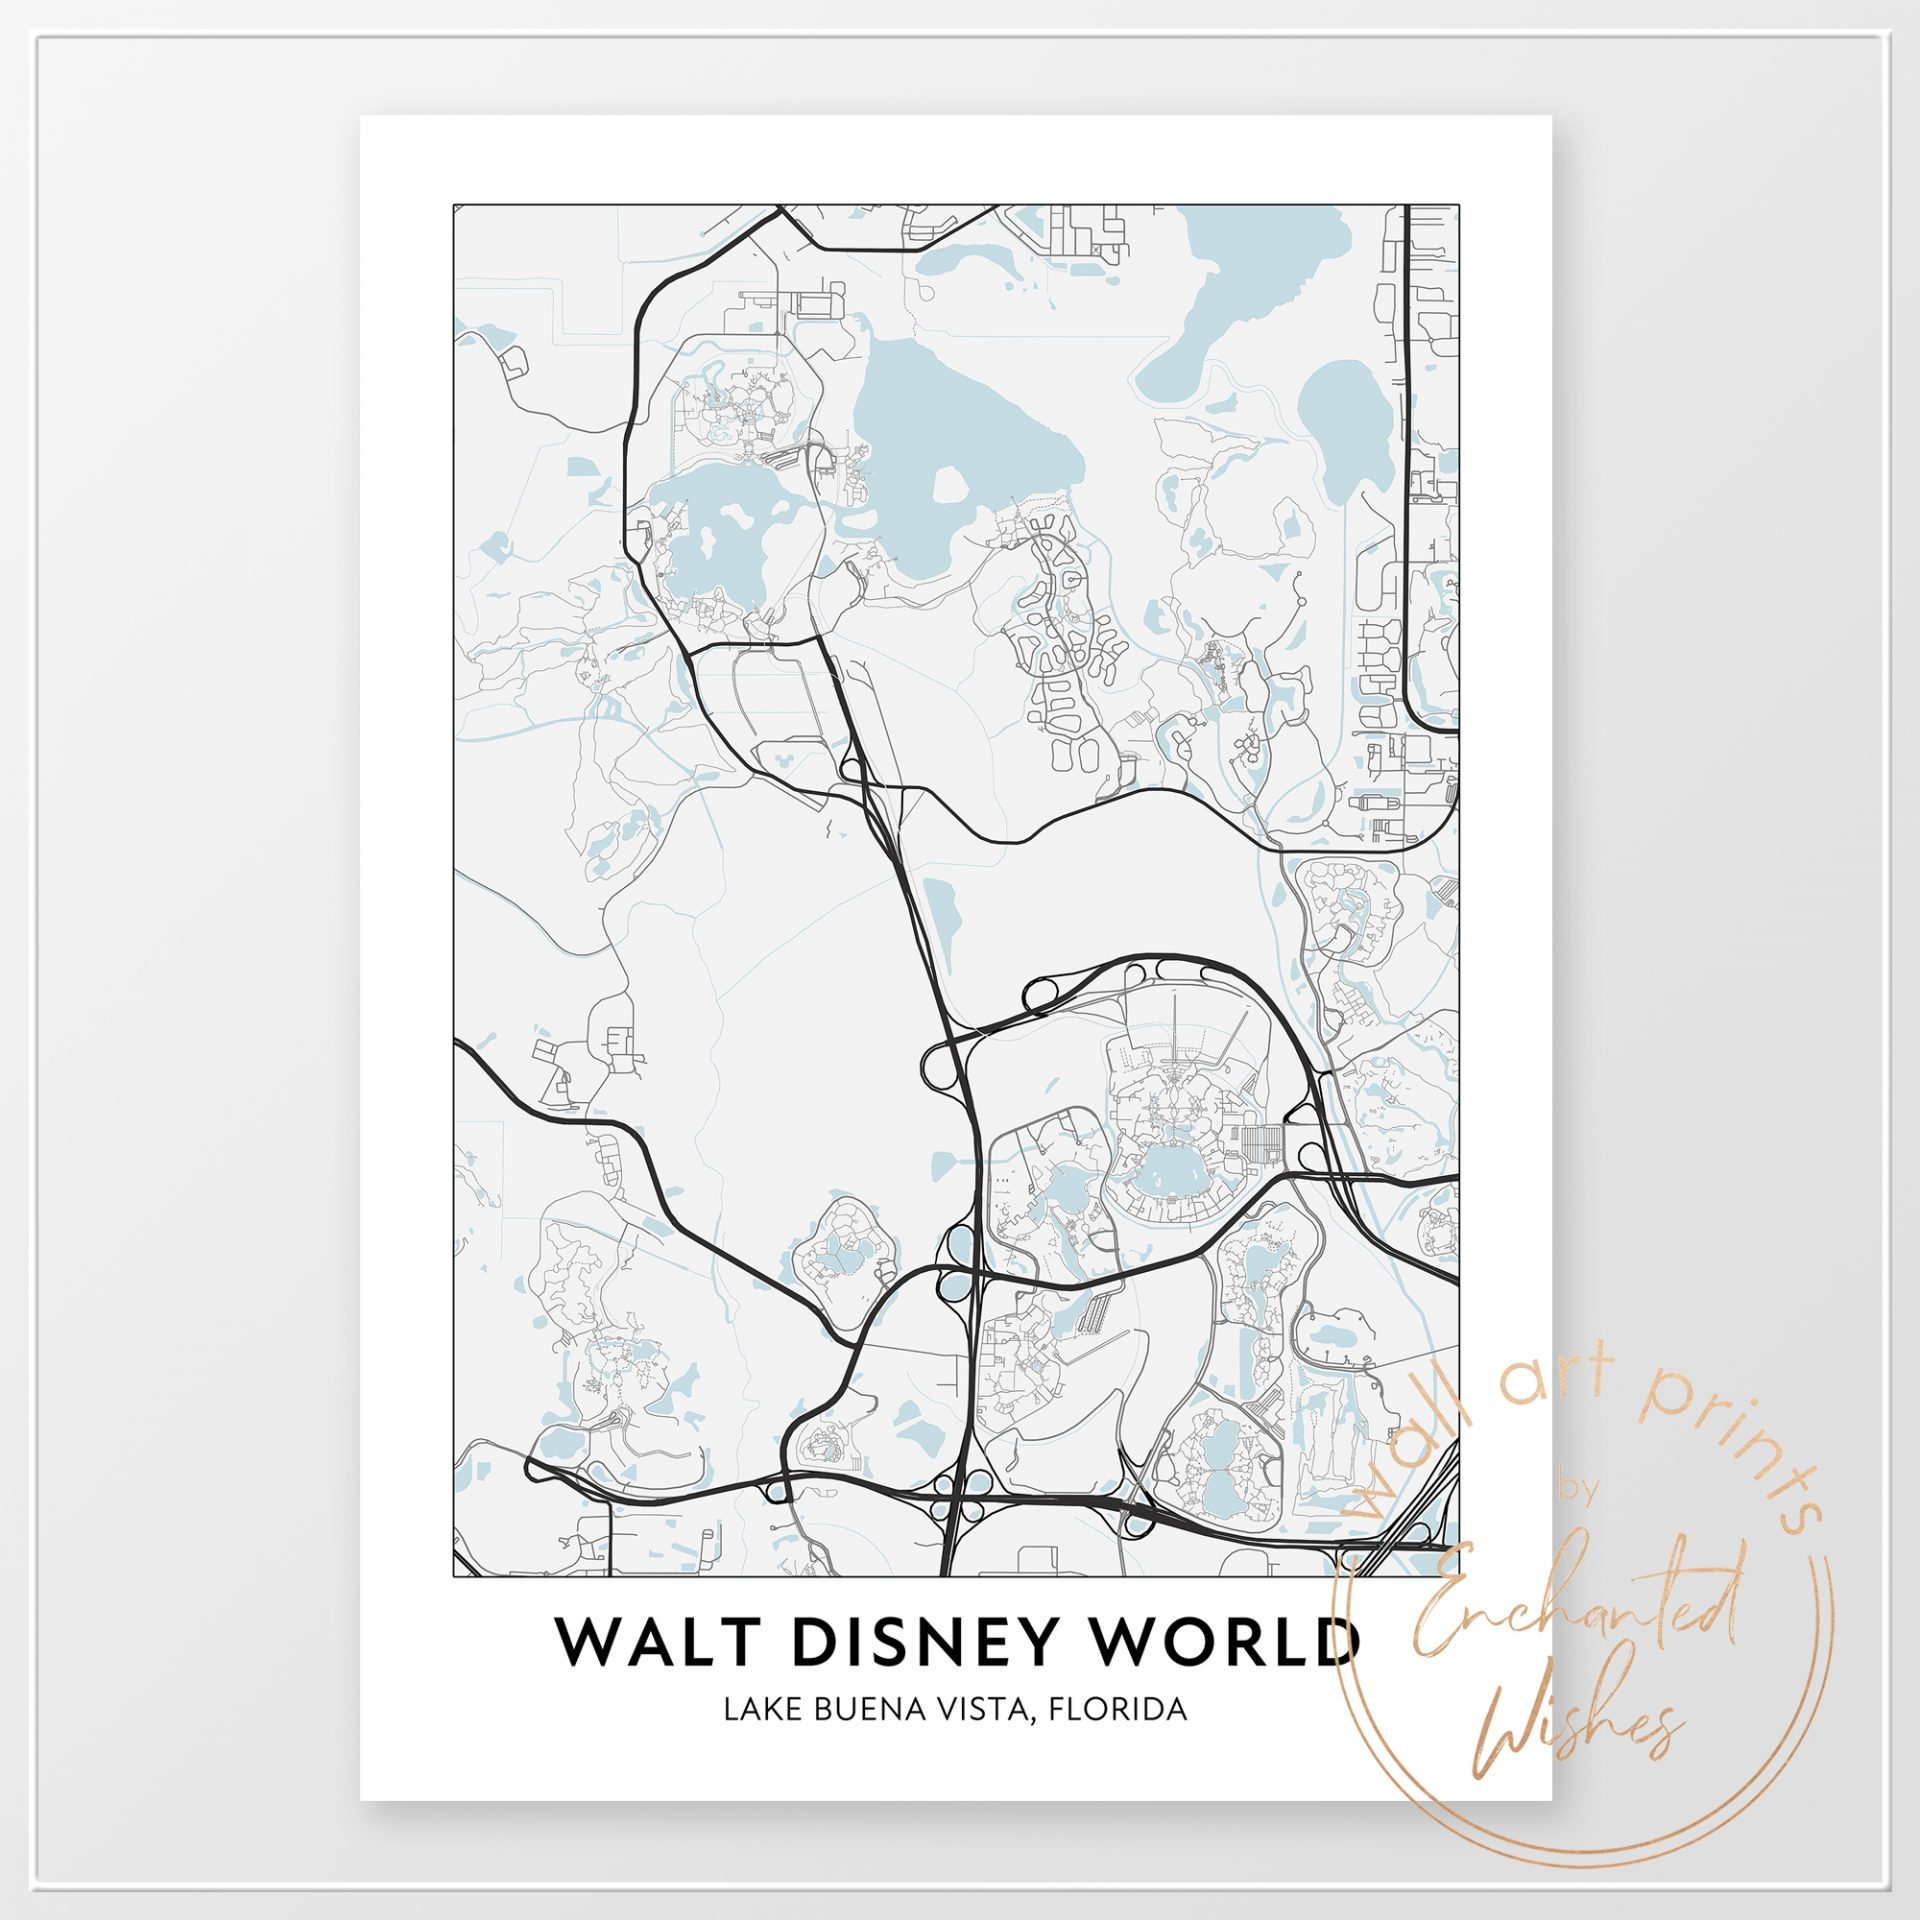 Walt Disney World map print